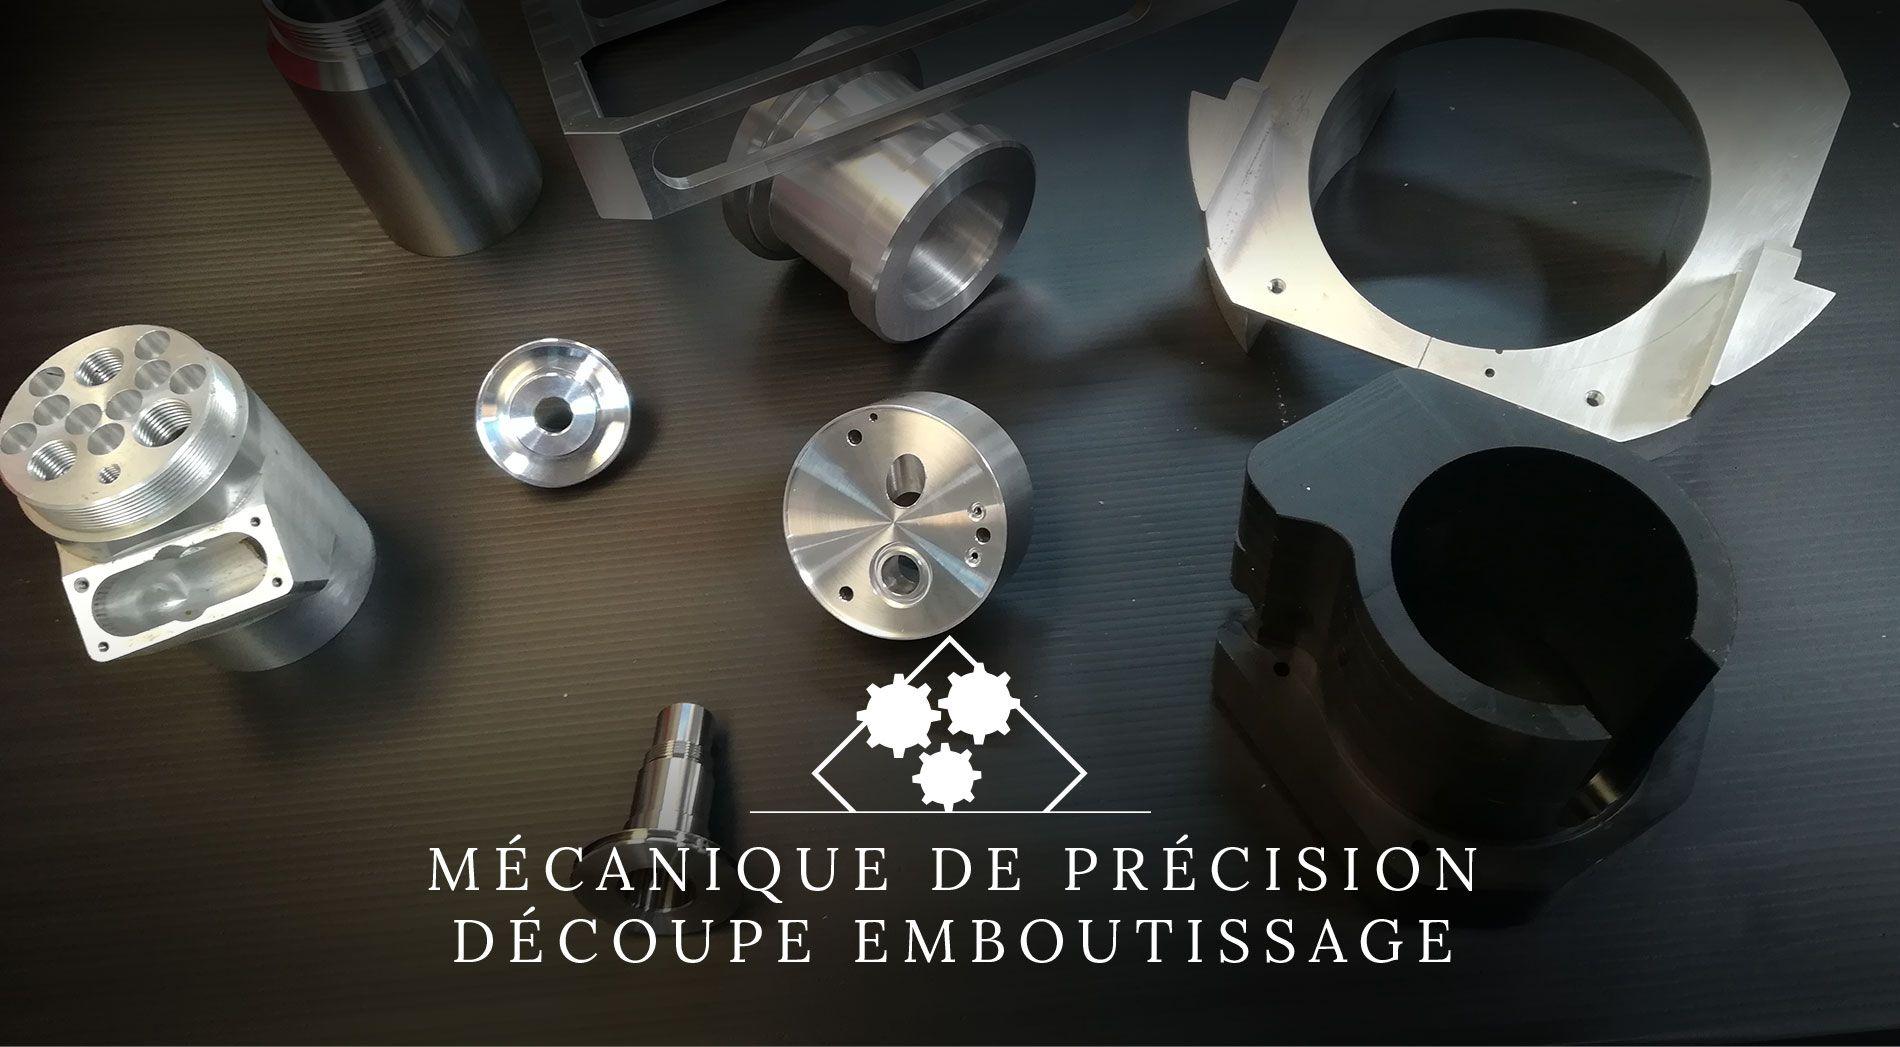 usinage mcanique de prcision